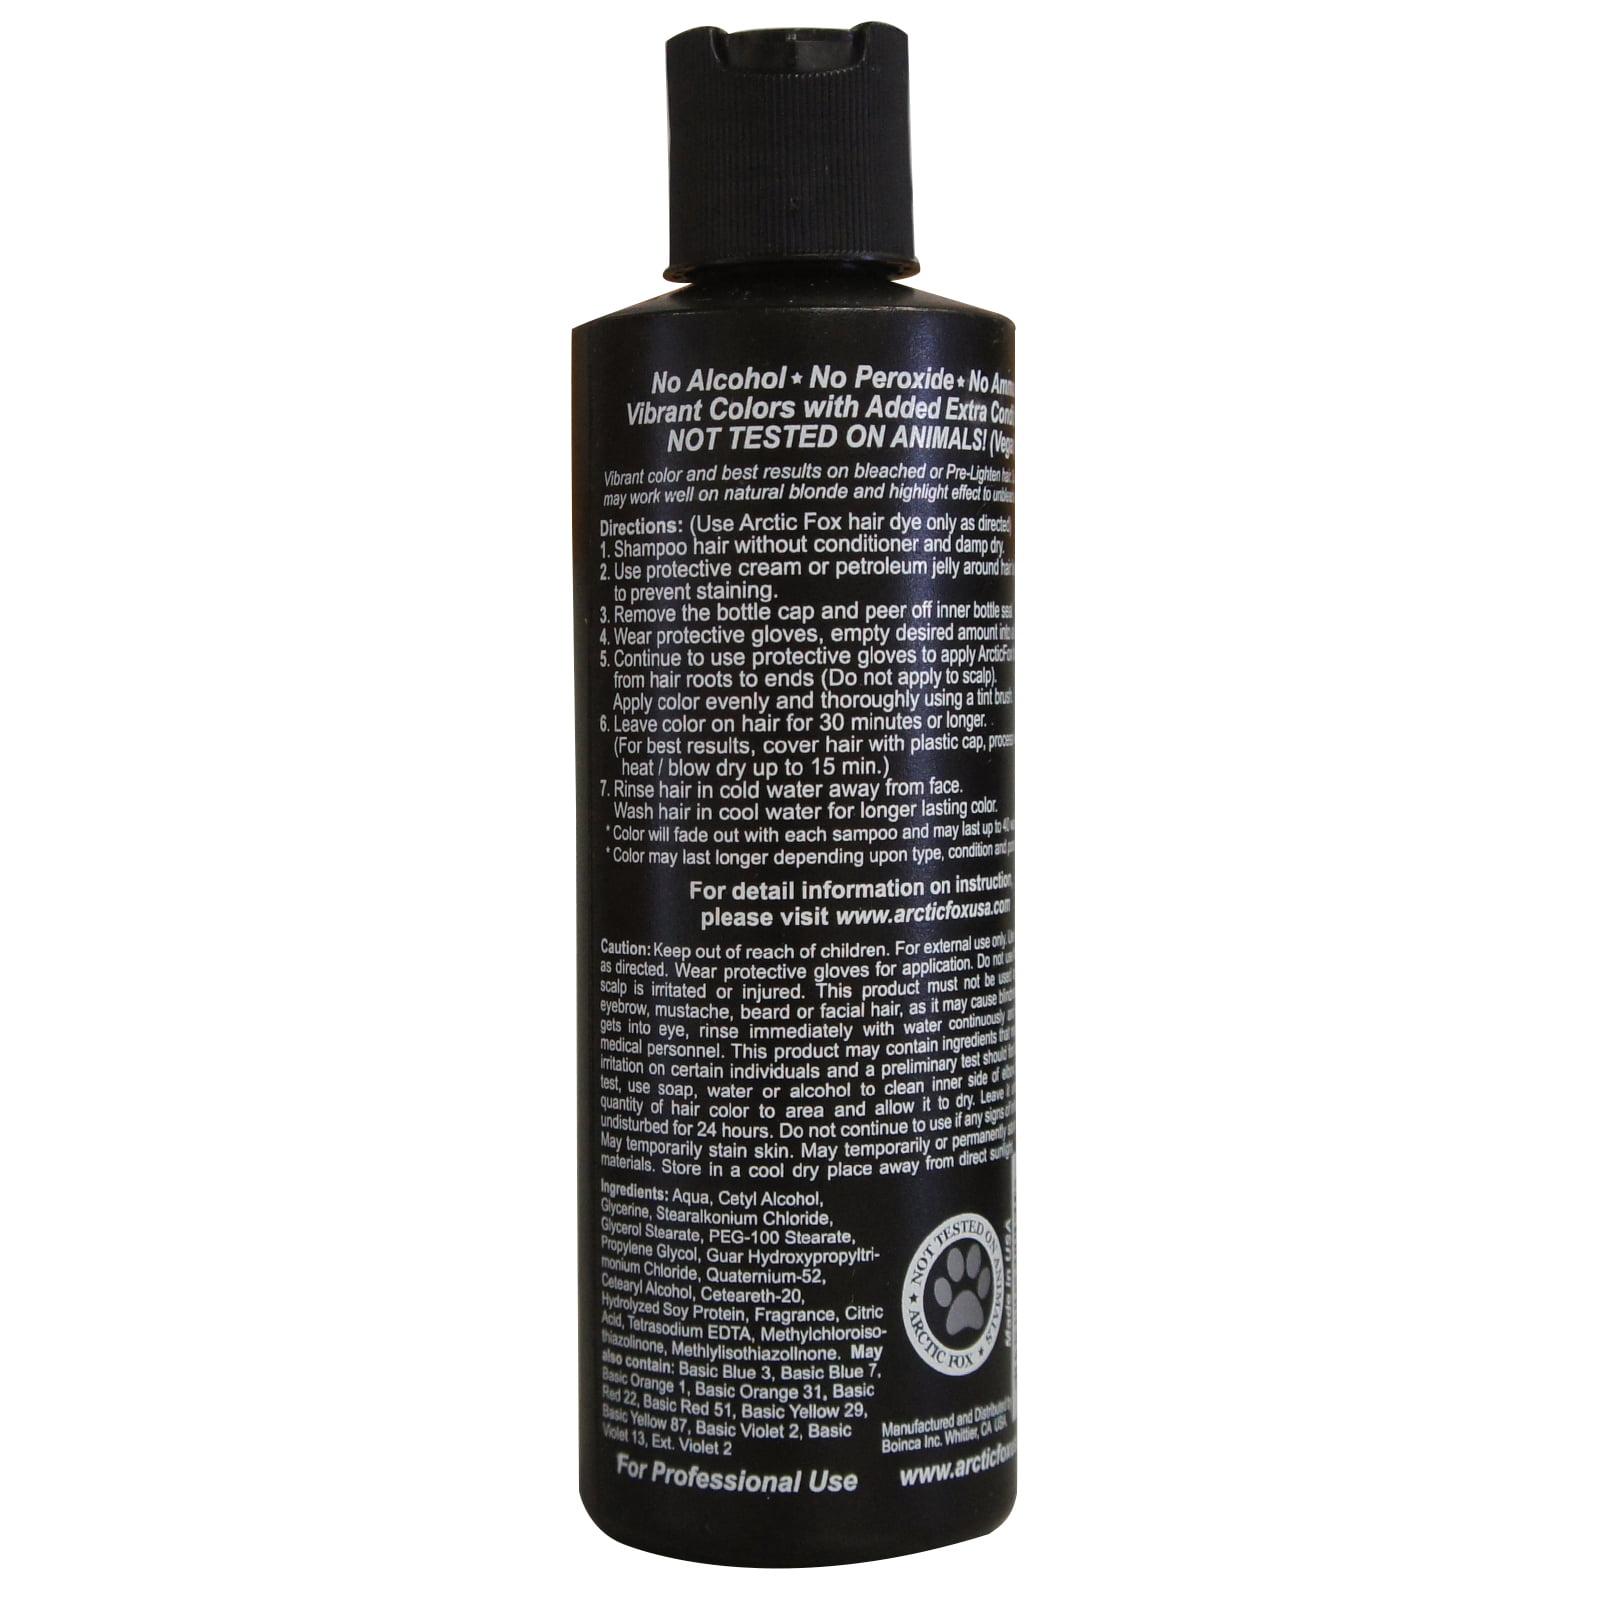 Arctic Fox Semi Permanent Hair Dye 8 Oz Walmart